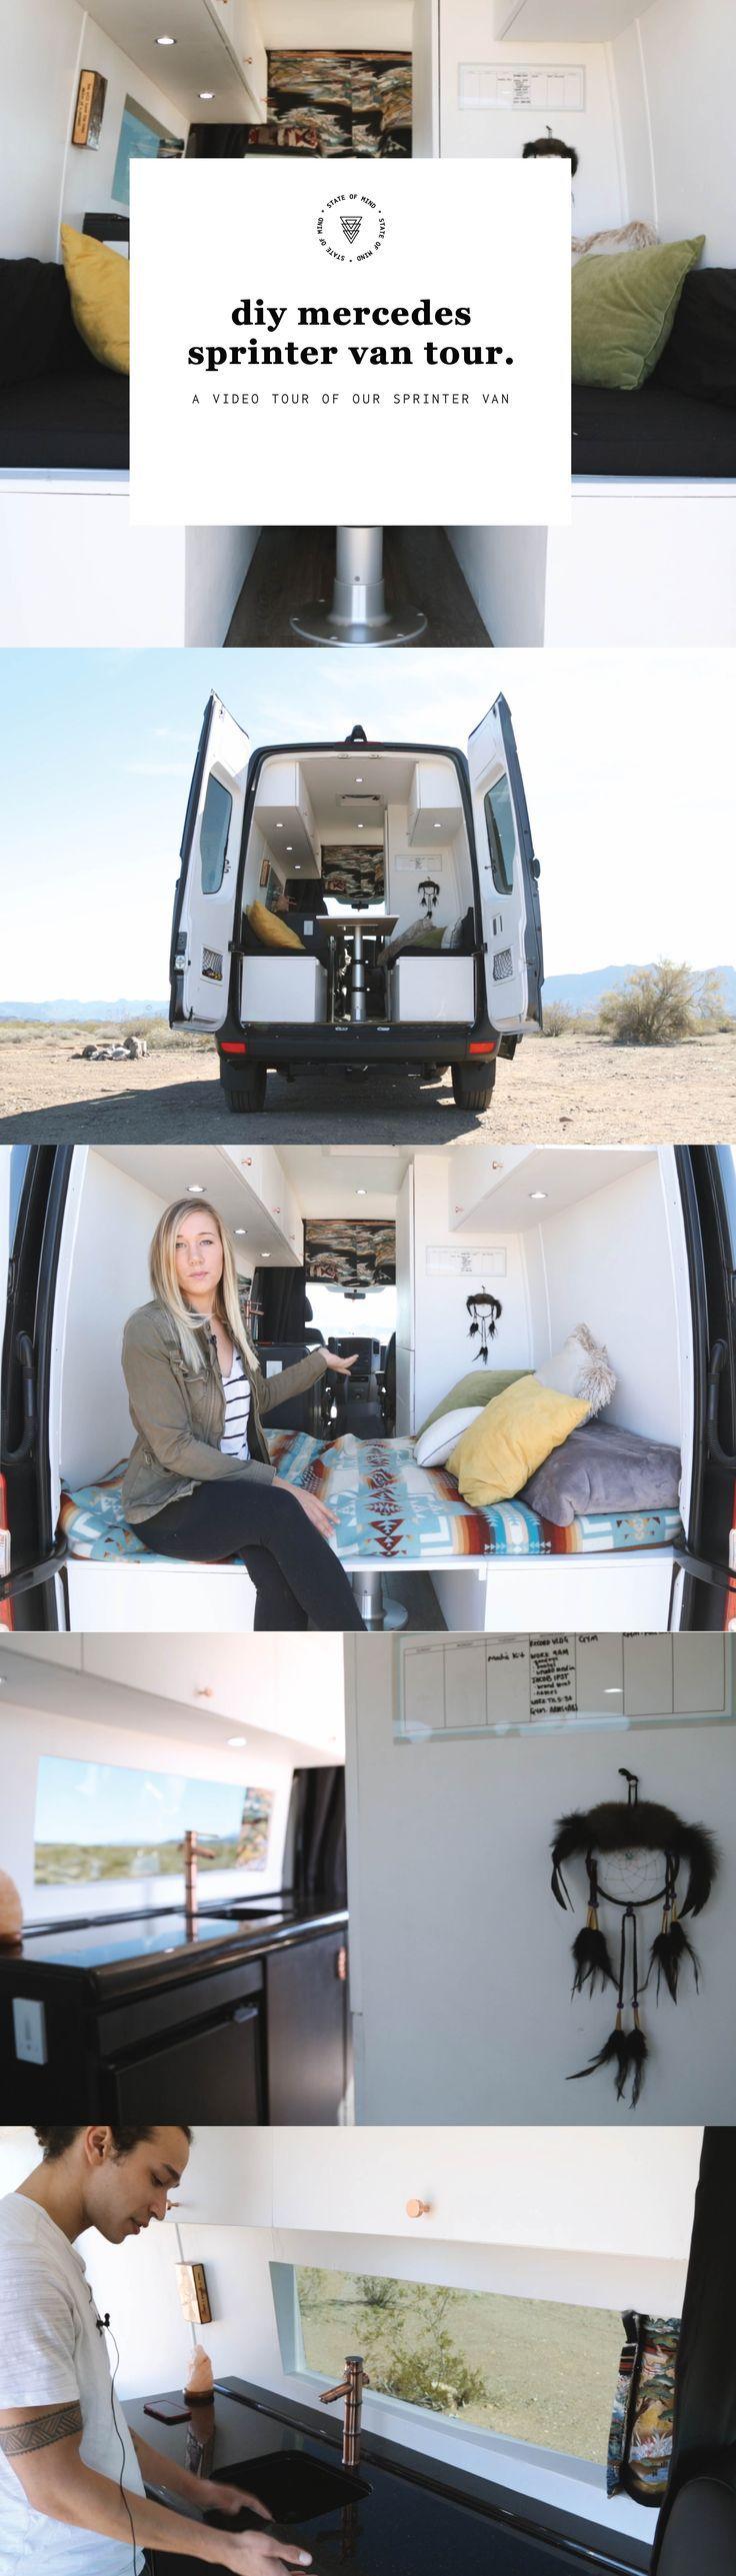 Van Life Diy Mercedes Sprinter Conversion Tour